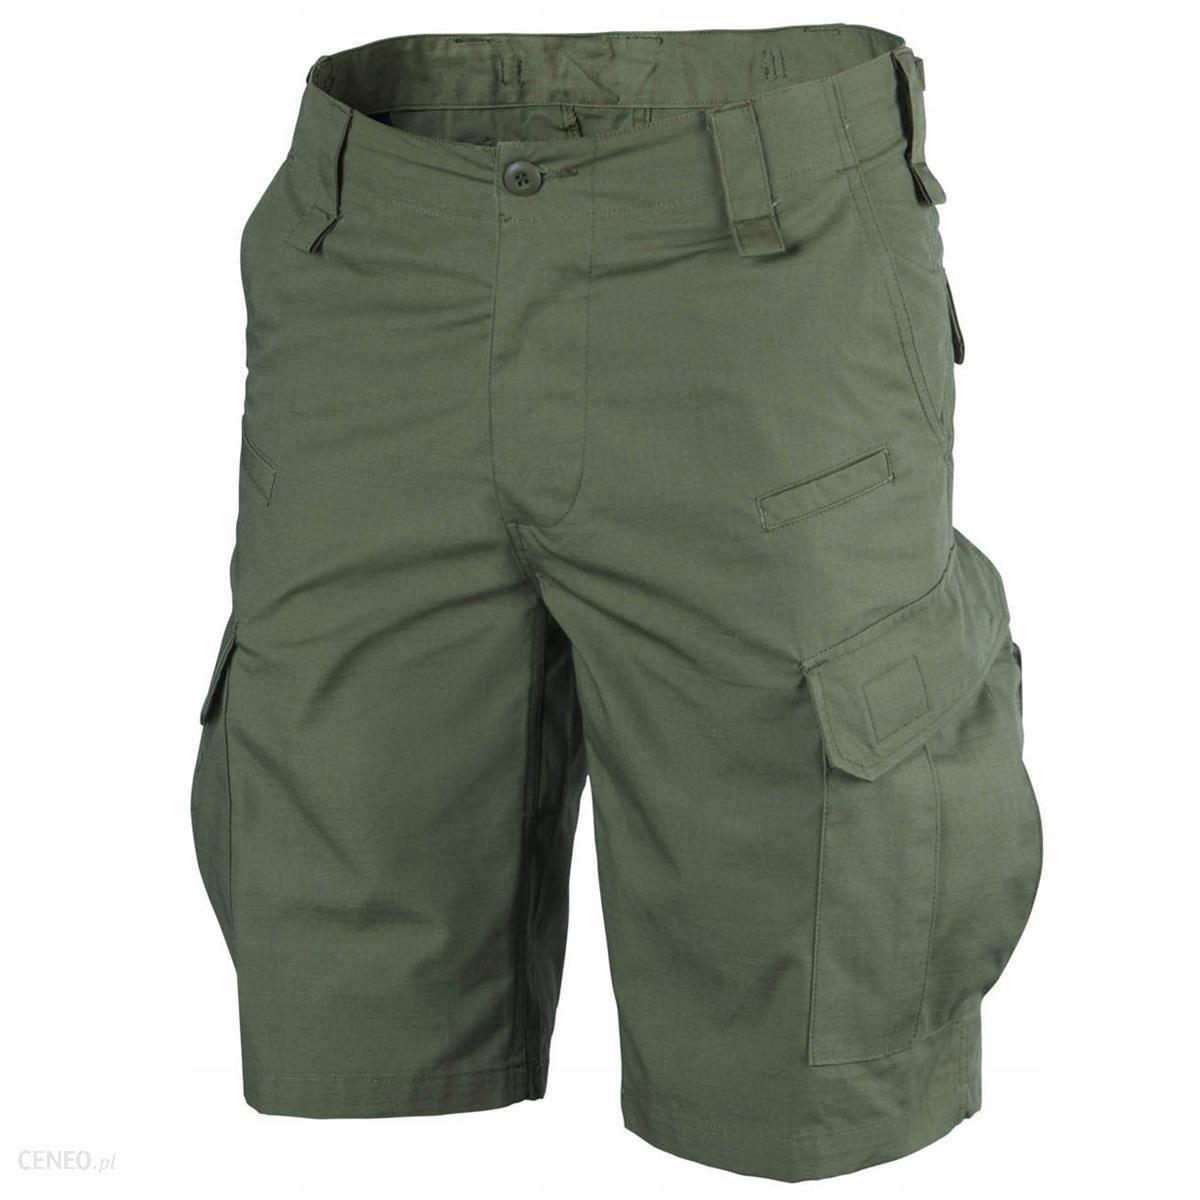 Helikon Spodnie Krótke Cpu R/s Olive Green S